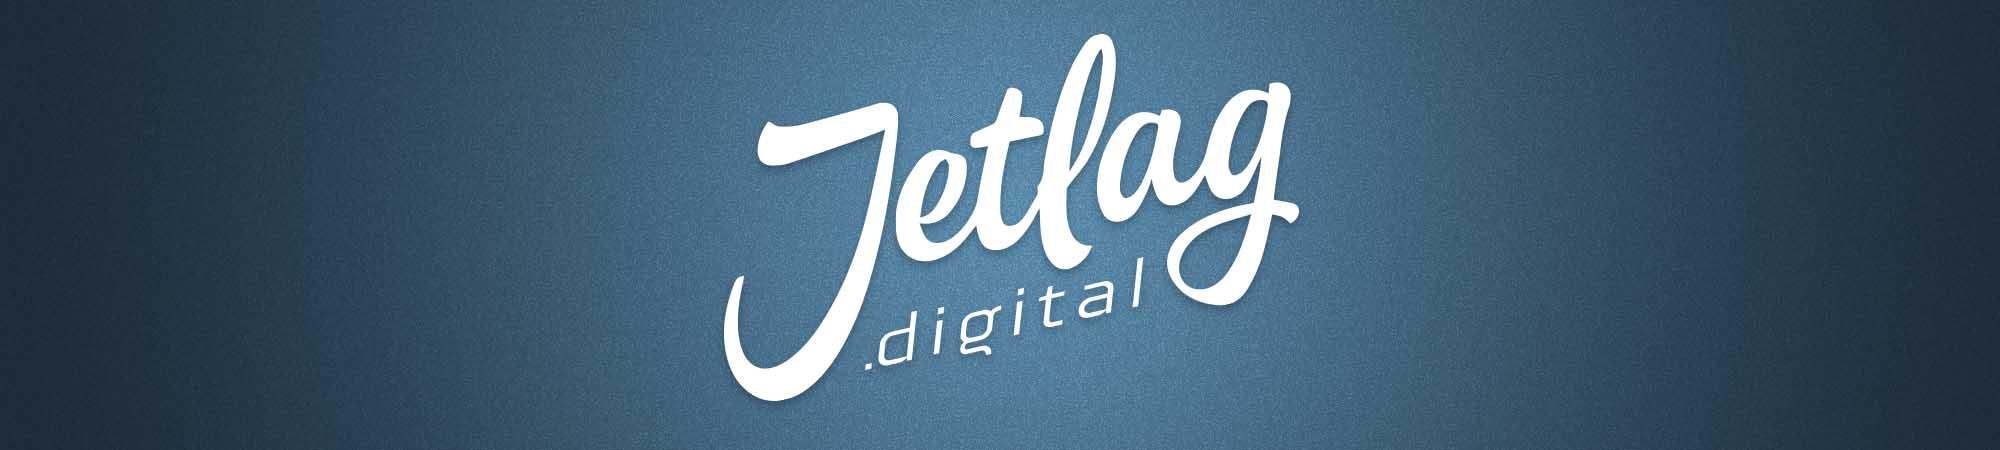 Jetlag.Digital